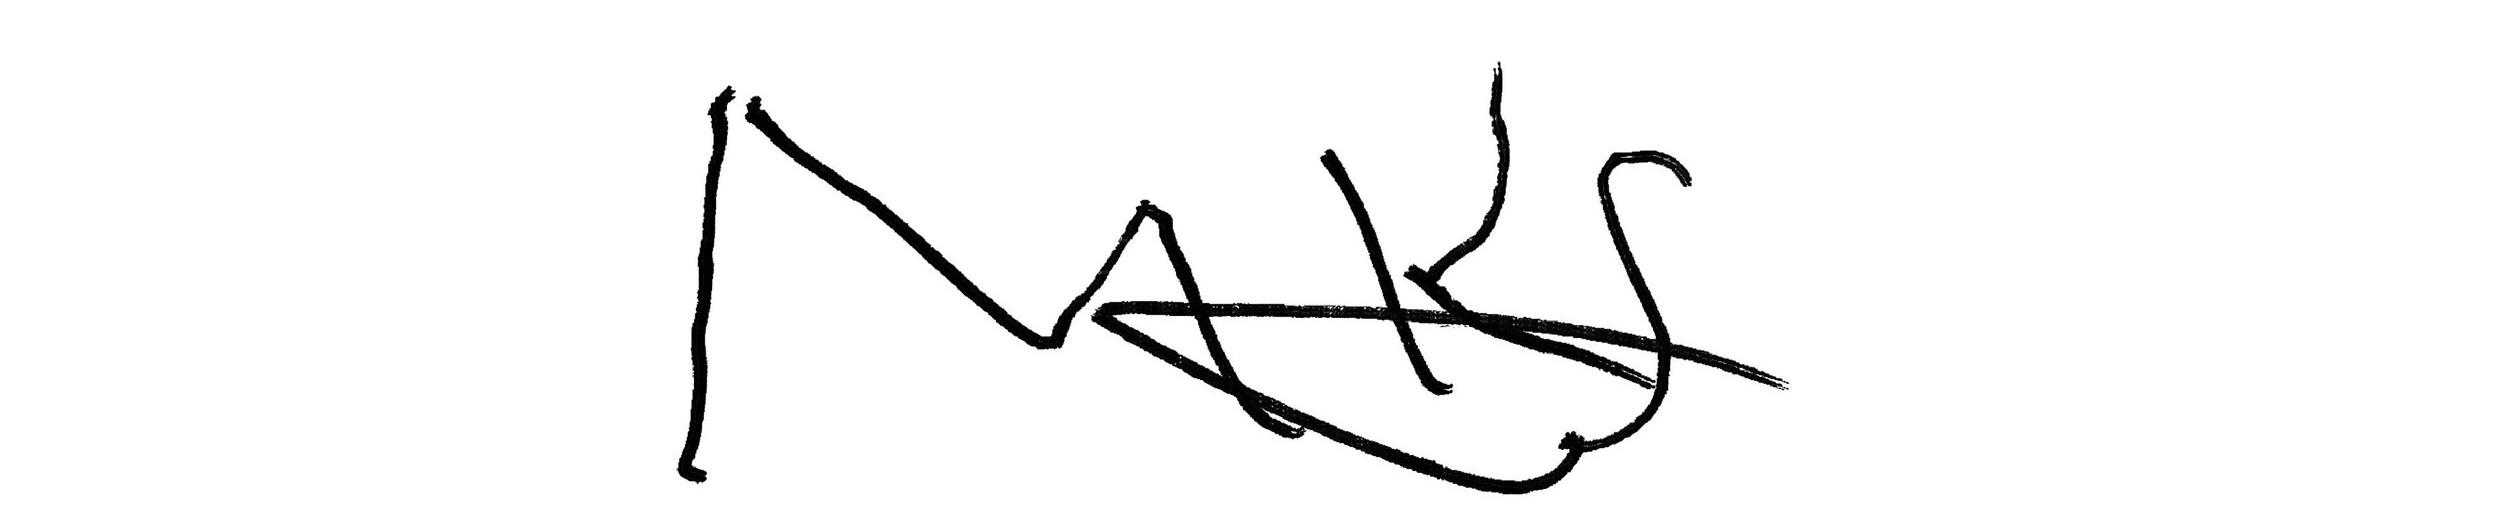 splash logo only copyd-01.jpg